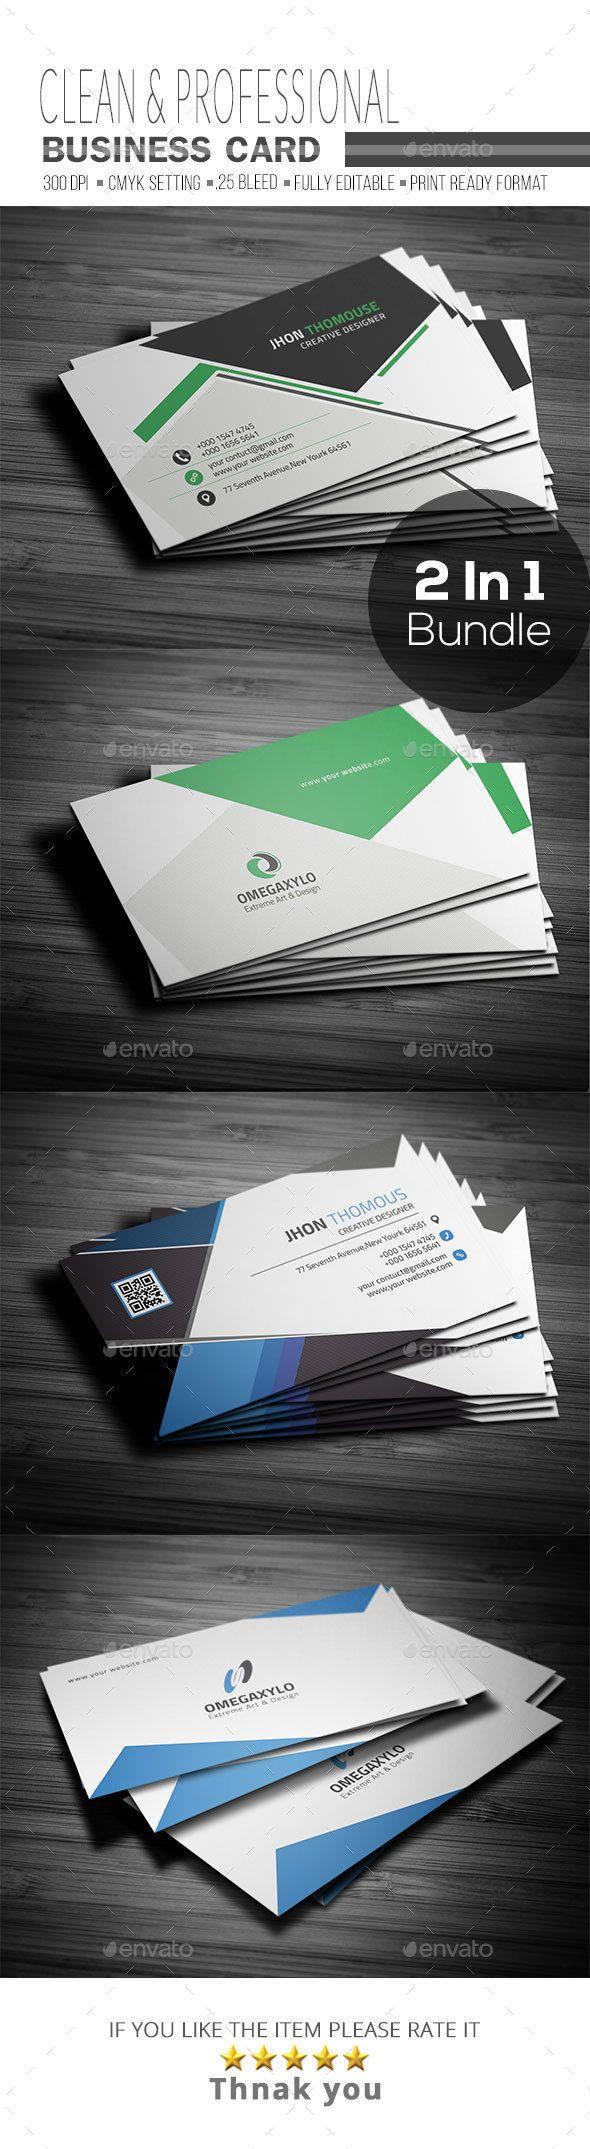 Beautiful business card star gift business card ideas etadamfo free business card templates star gallery card design and card reheart Choice Image